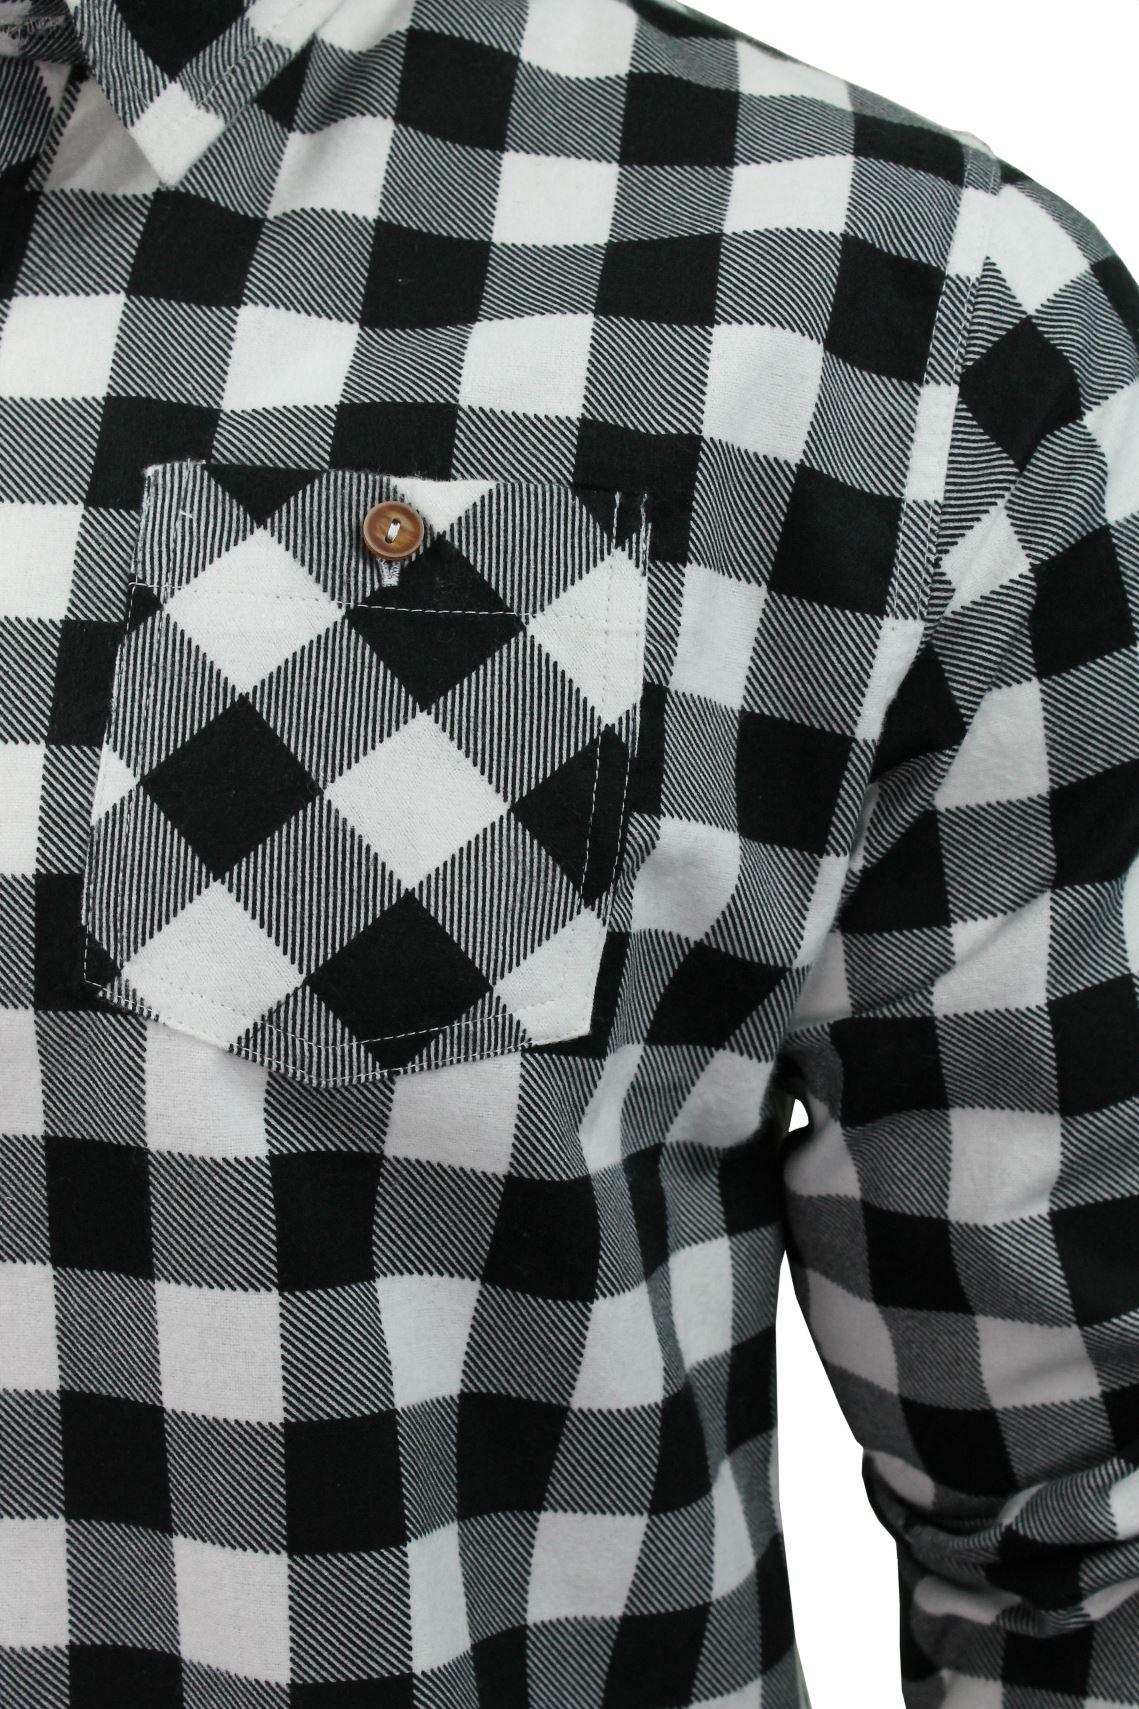 Brave-Soul-Brushed-Flannel-Check-Cotton-Jack-Shirt-Long-Sleeved thumbnail 11